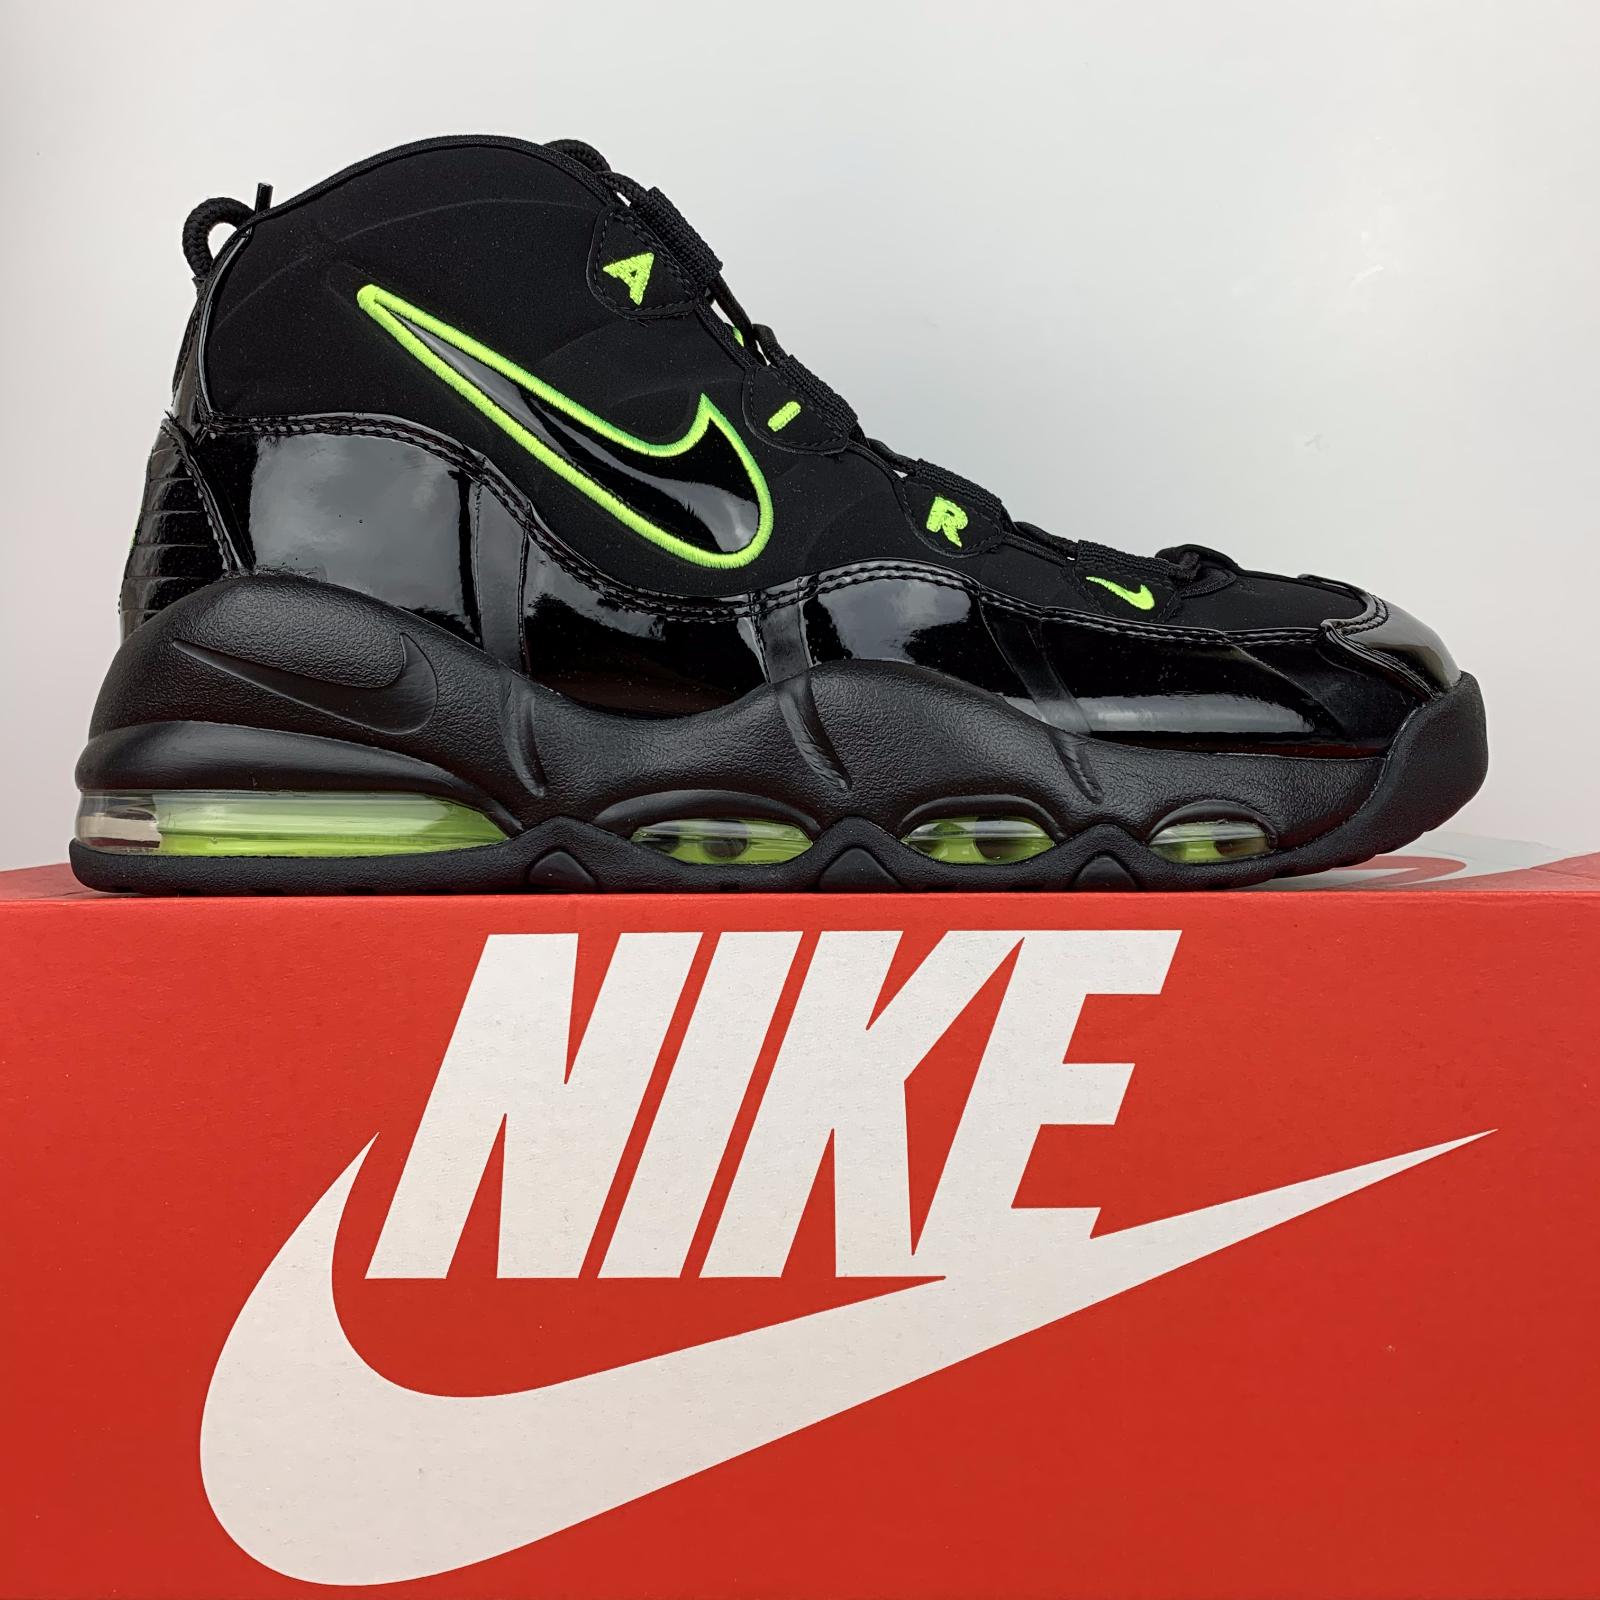 Nike Air Max Uptempo '95 Basketball Shoes Black Volt CK0892-